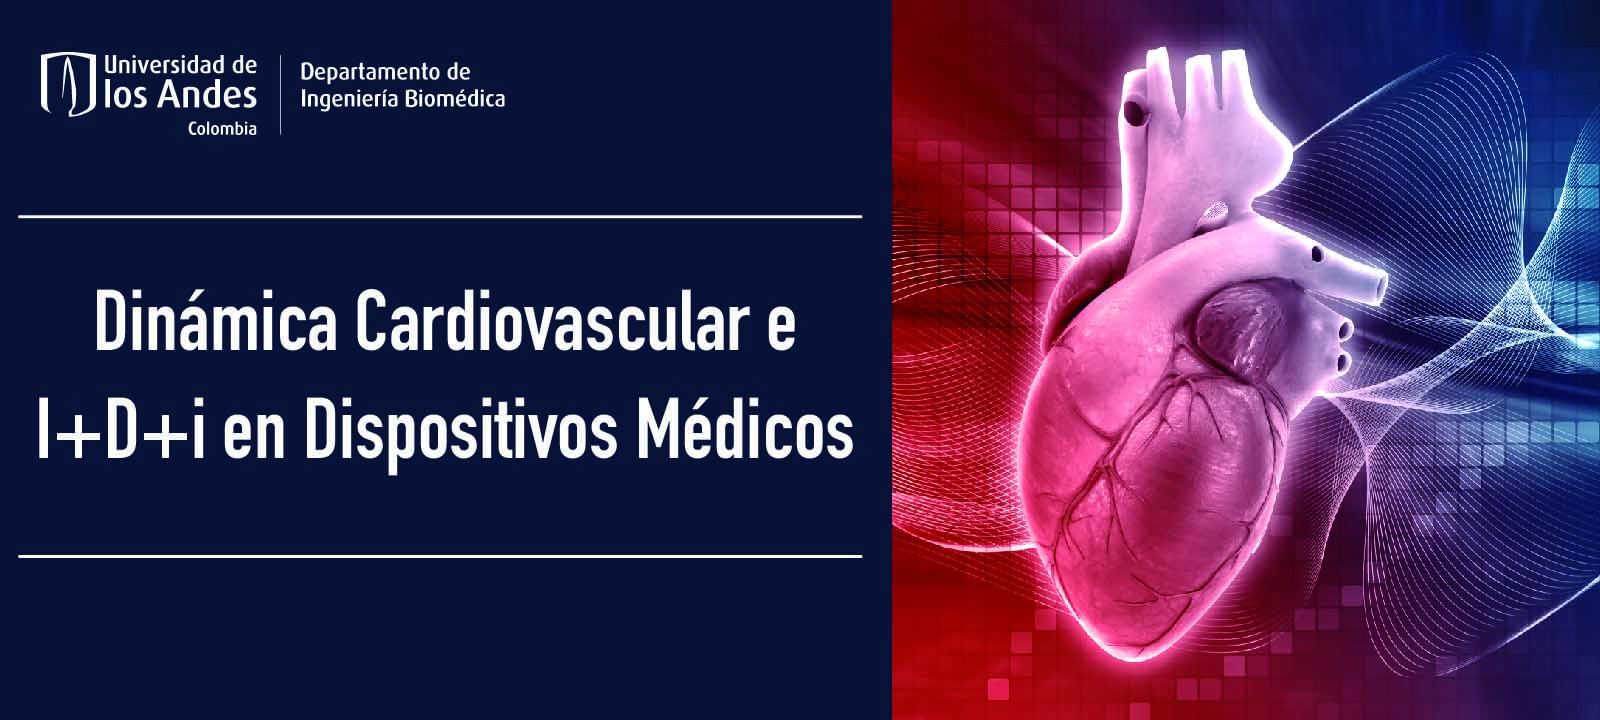 Dinámica Cardiovascular